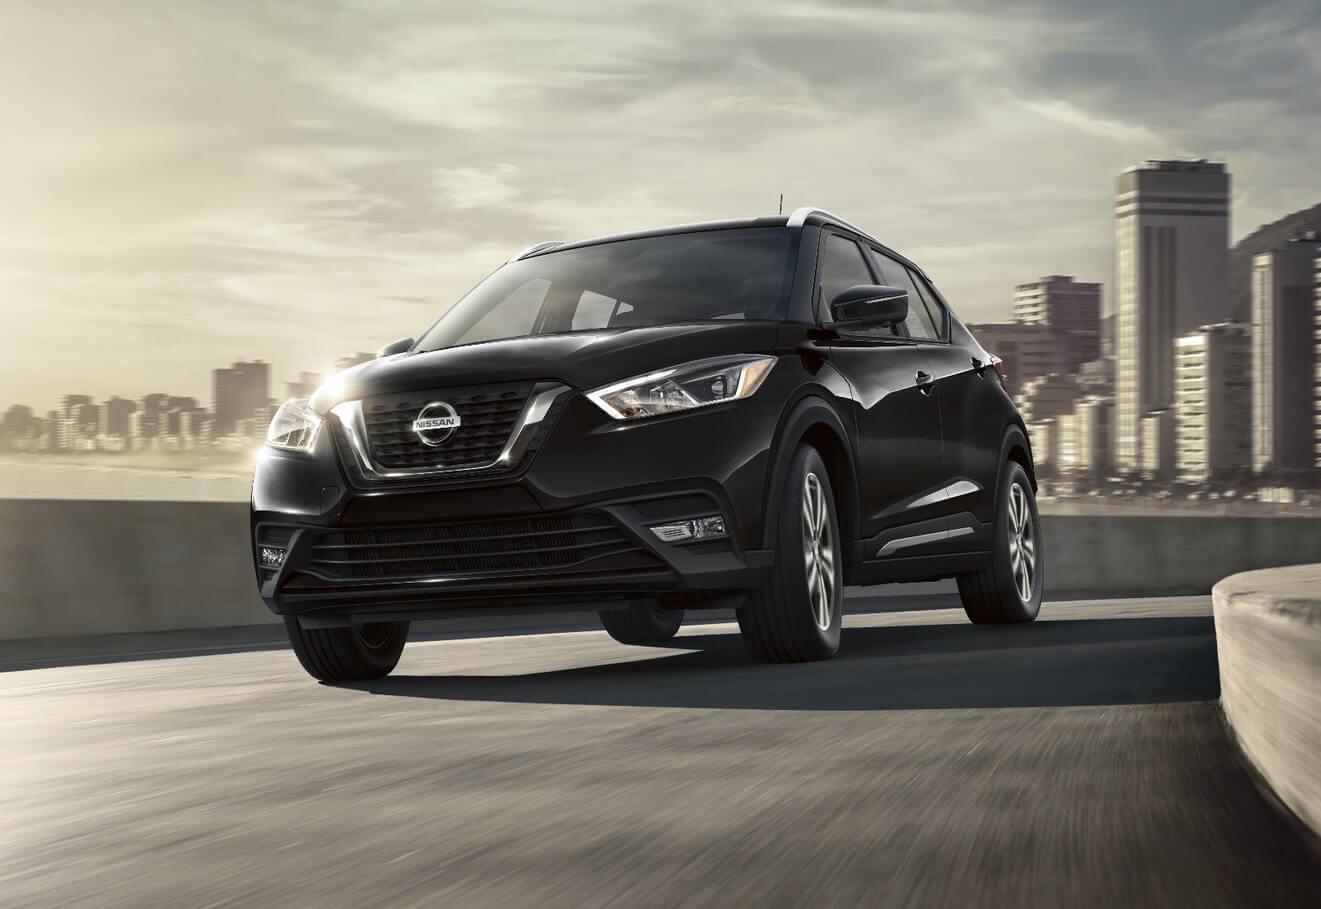 2020 Nissan Kicks Engine Specs